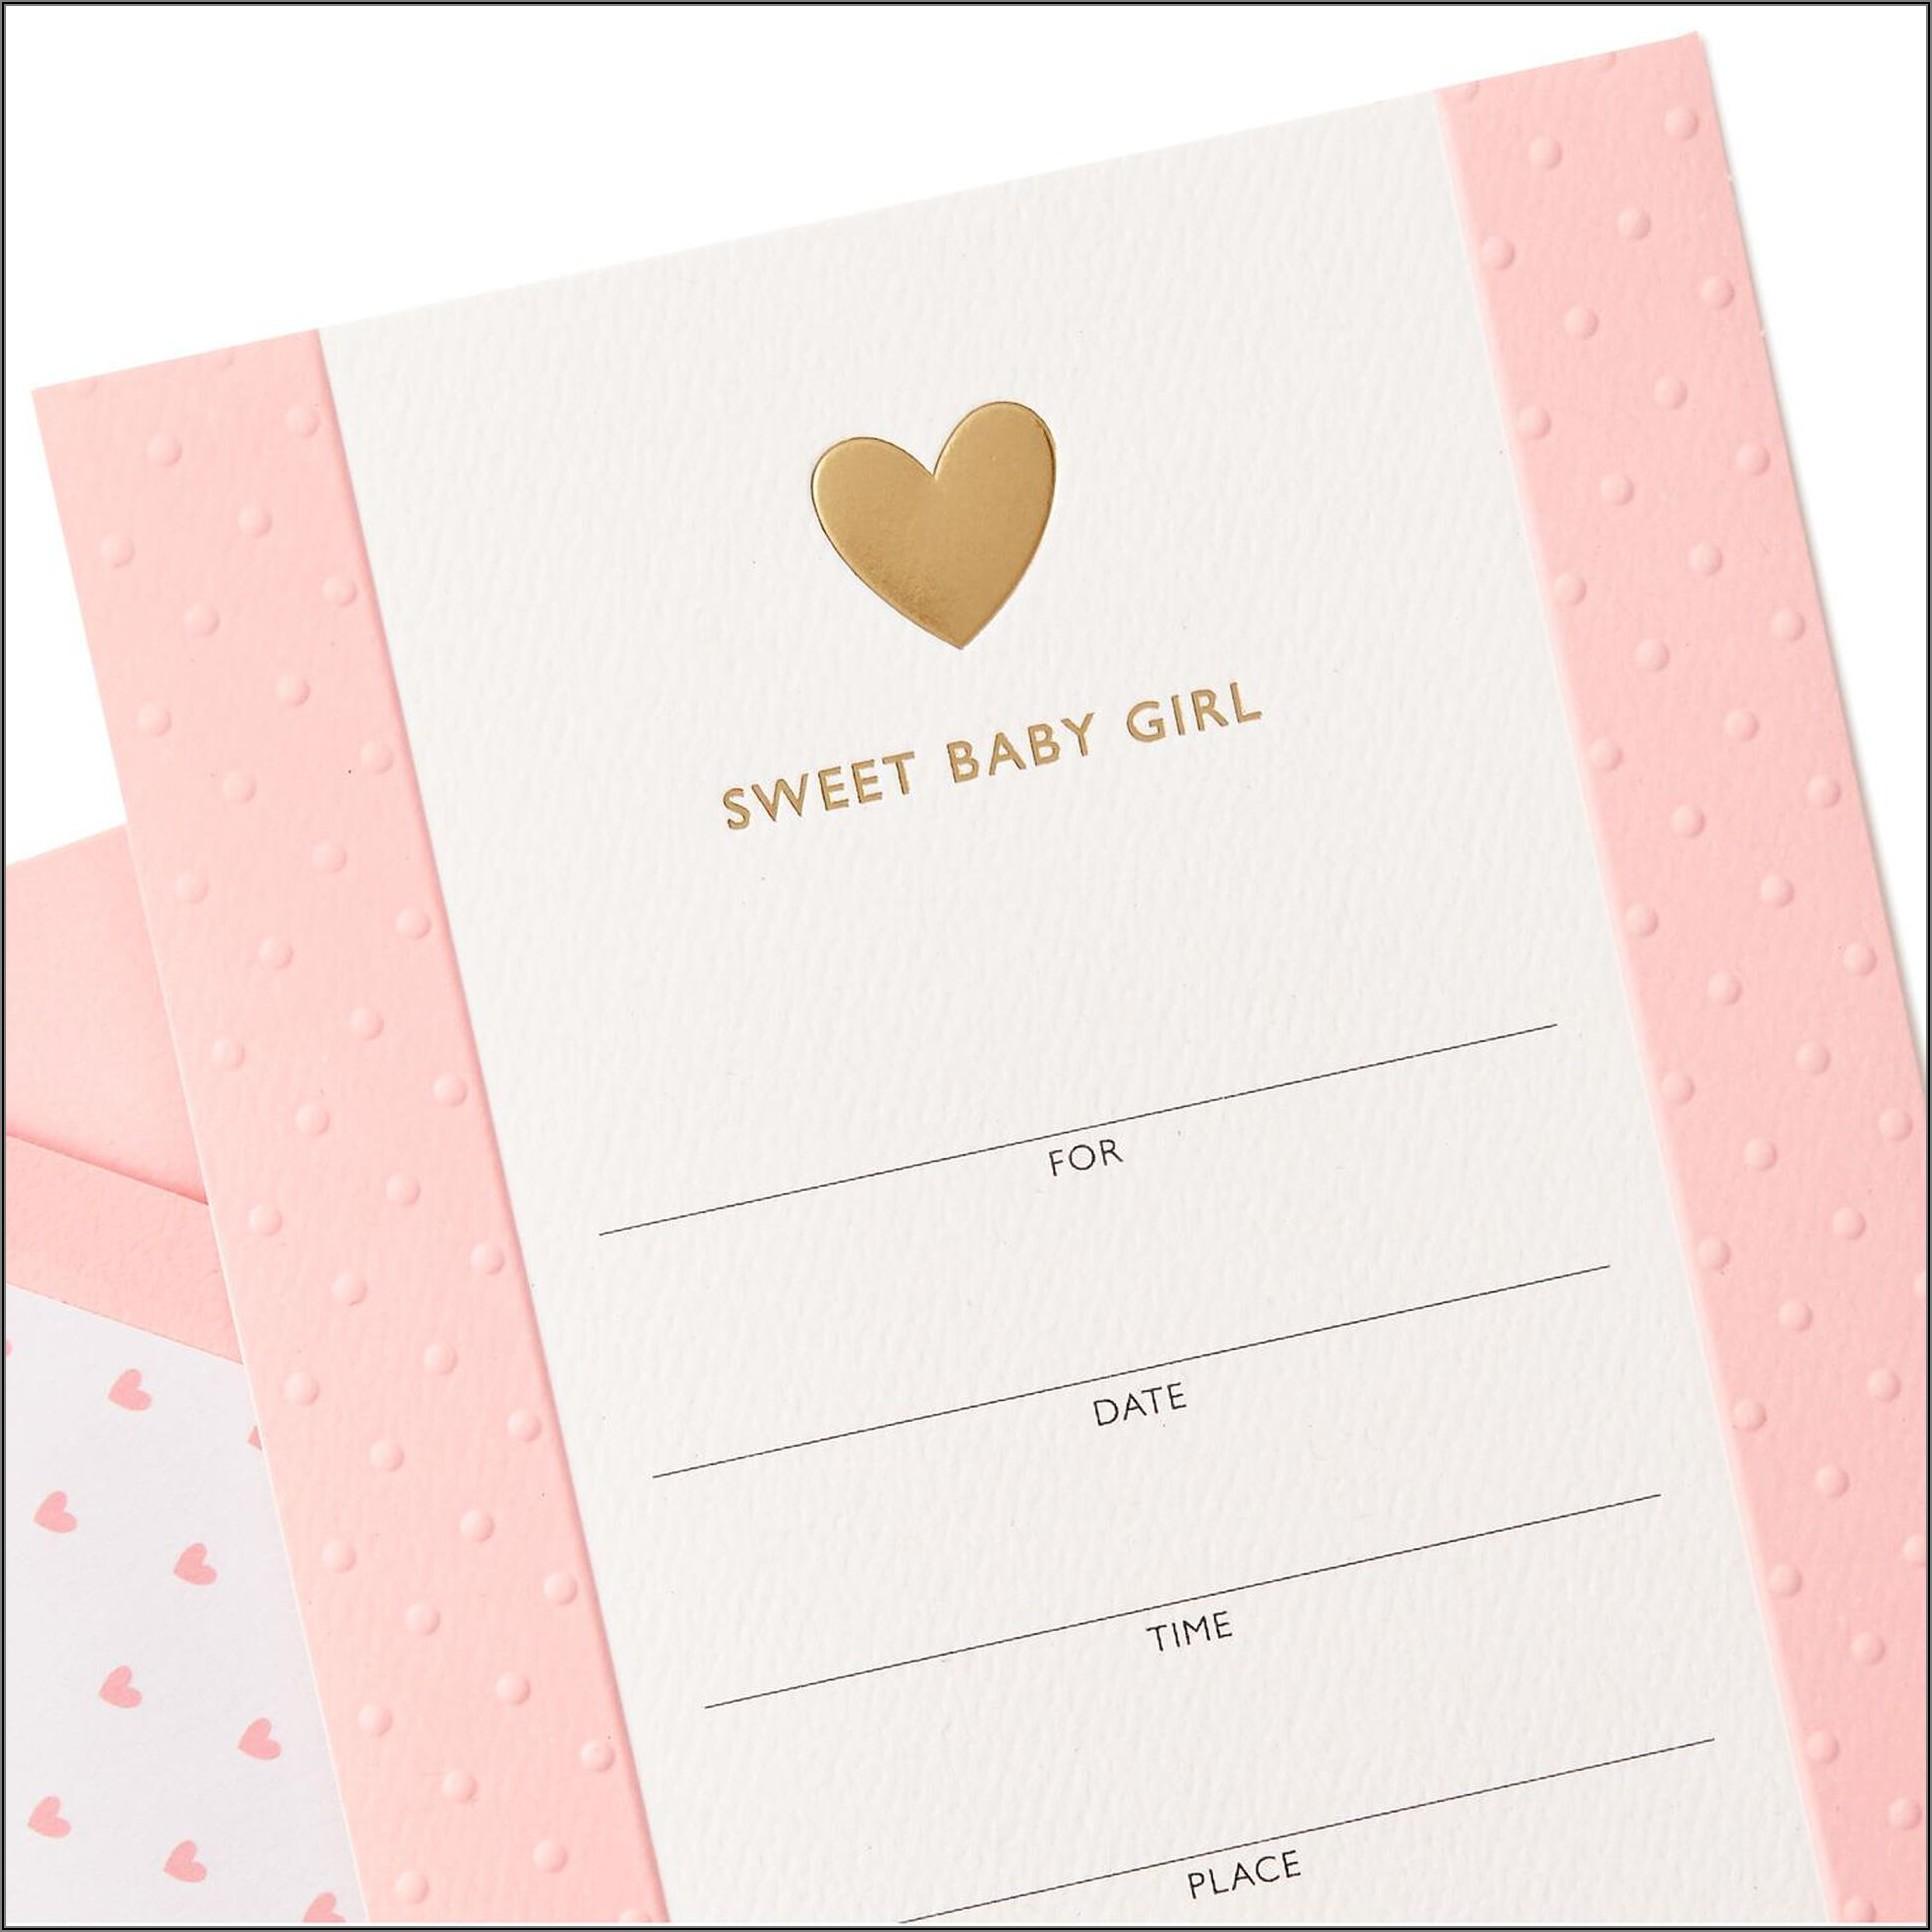 Sweet Baby Girl Shower Invitations